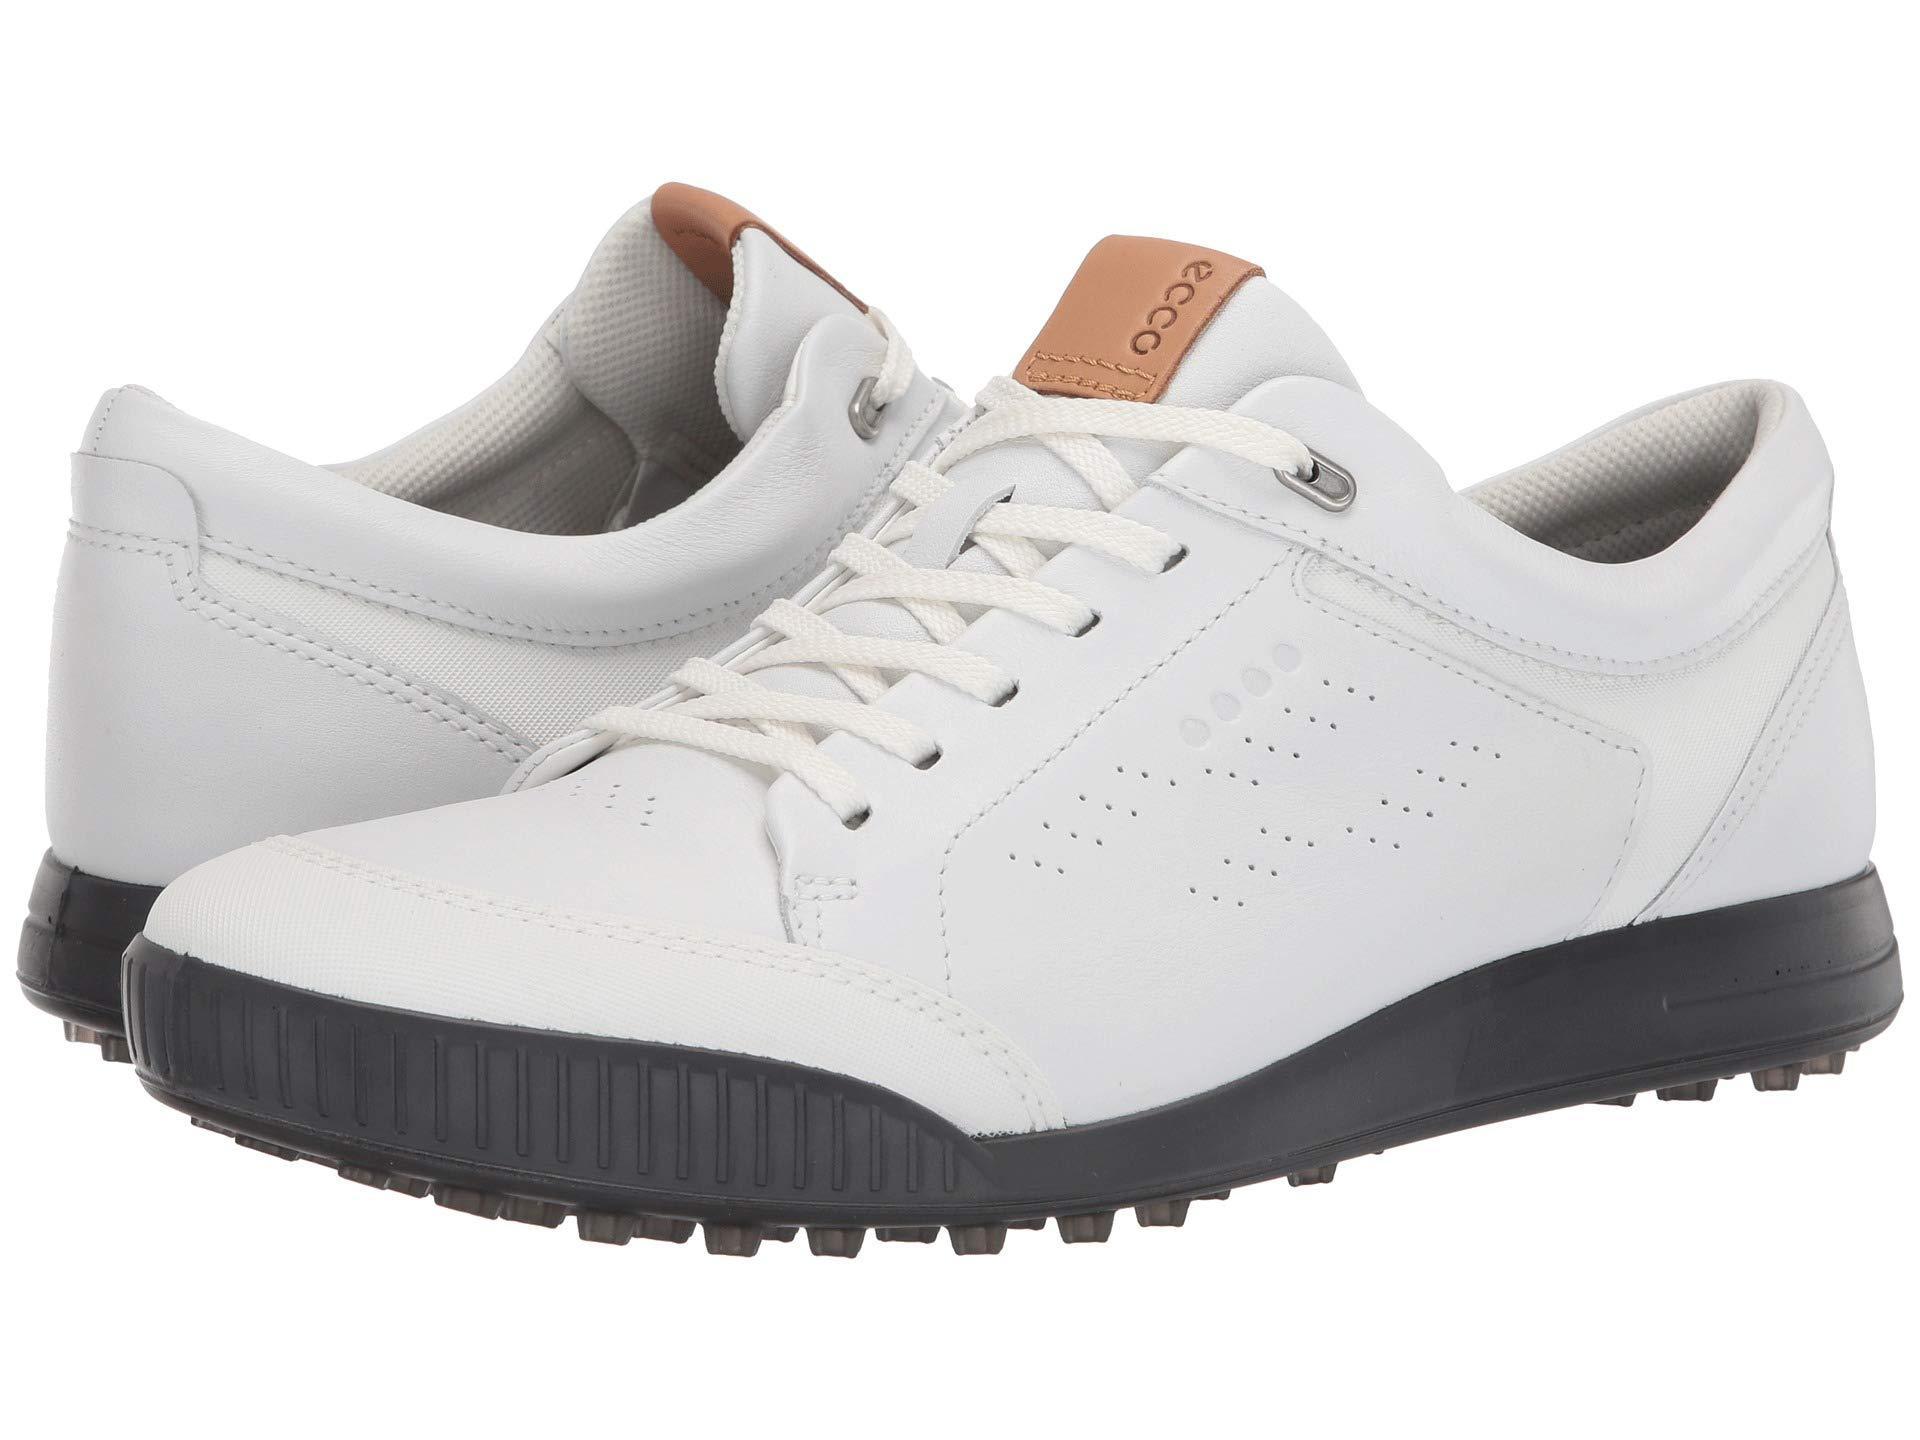 Lyst - Ecco Street Retro Lx (marine) Men s Golf Shoes for Men 943831b2b